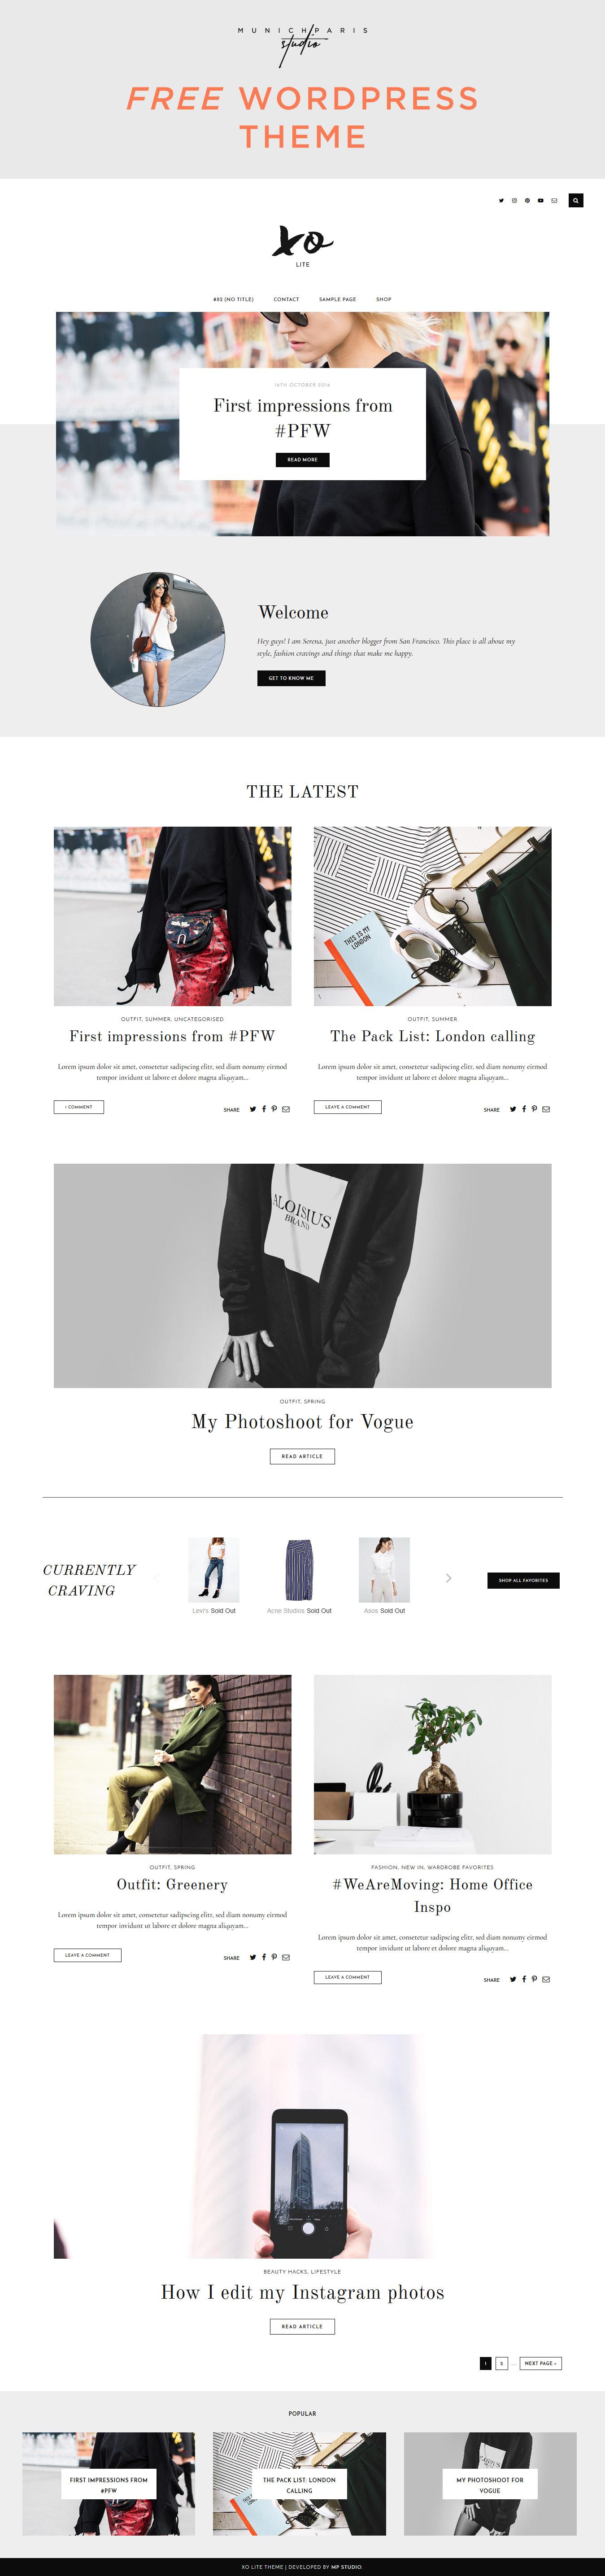 Free WordPress Theme XO Lite by MunichParis Studio We are